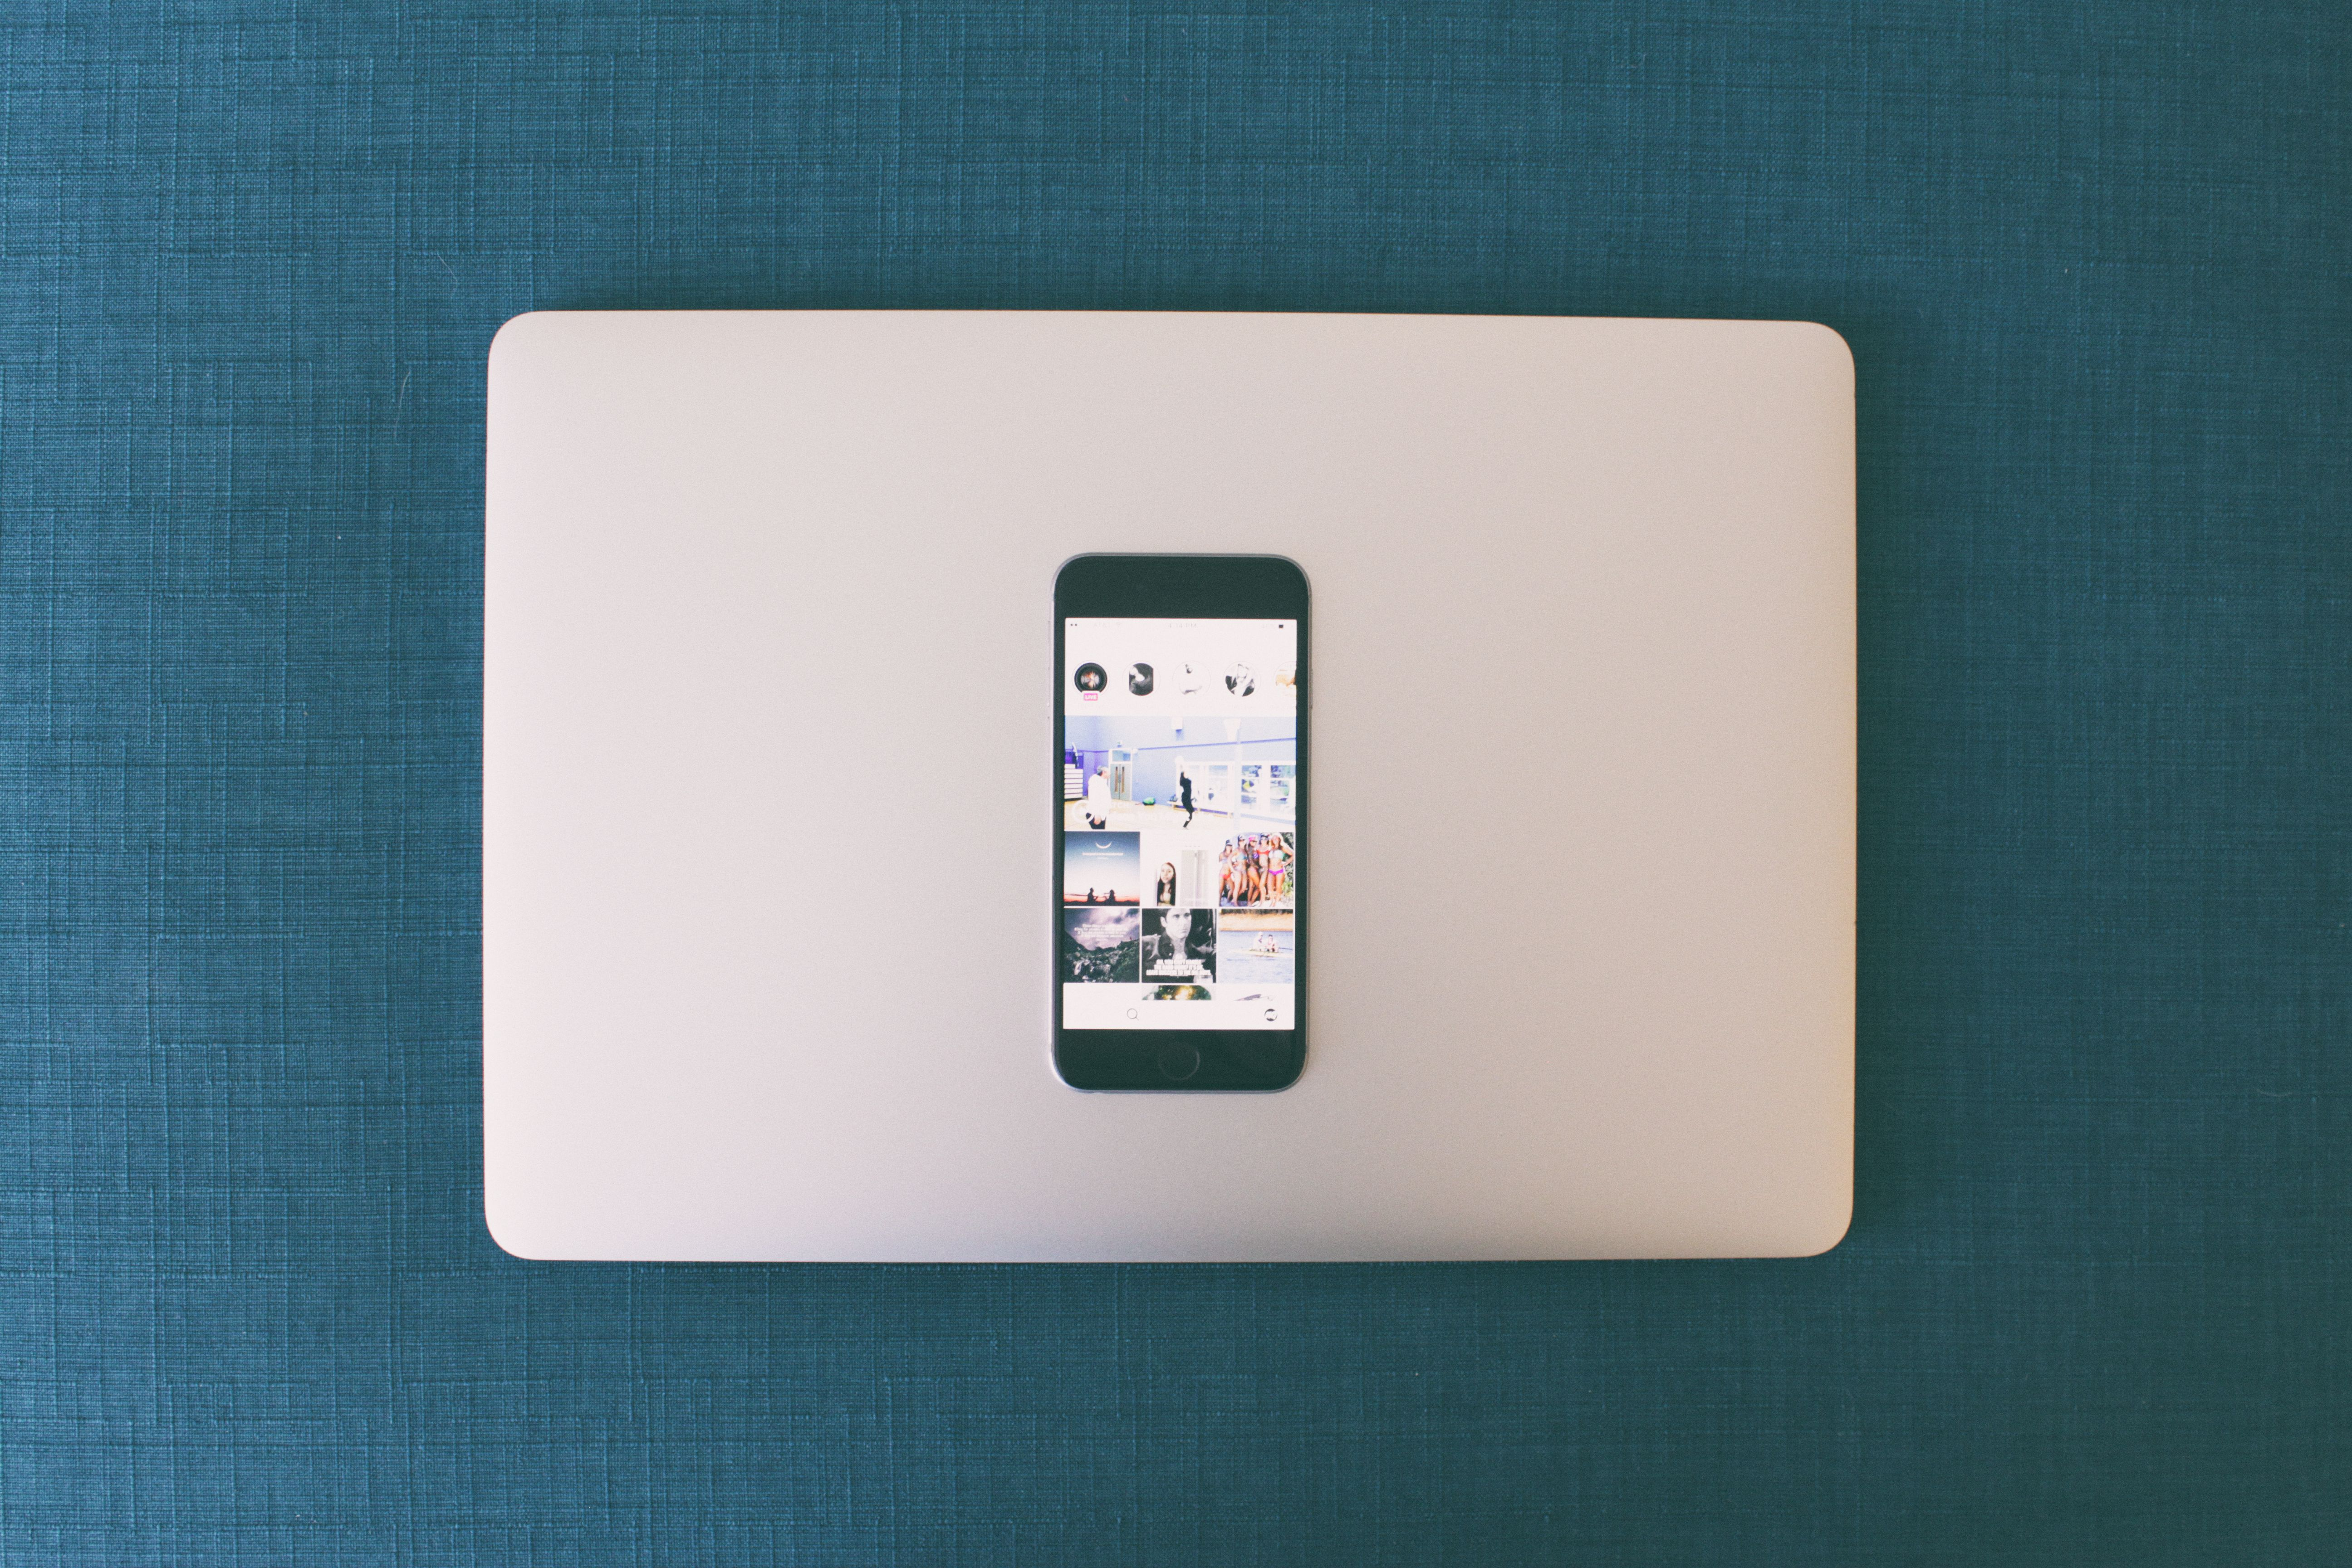 Space Gray Iphone 6 on Macbook